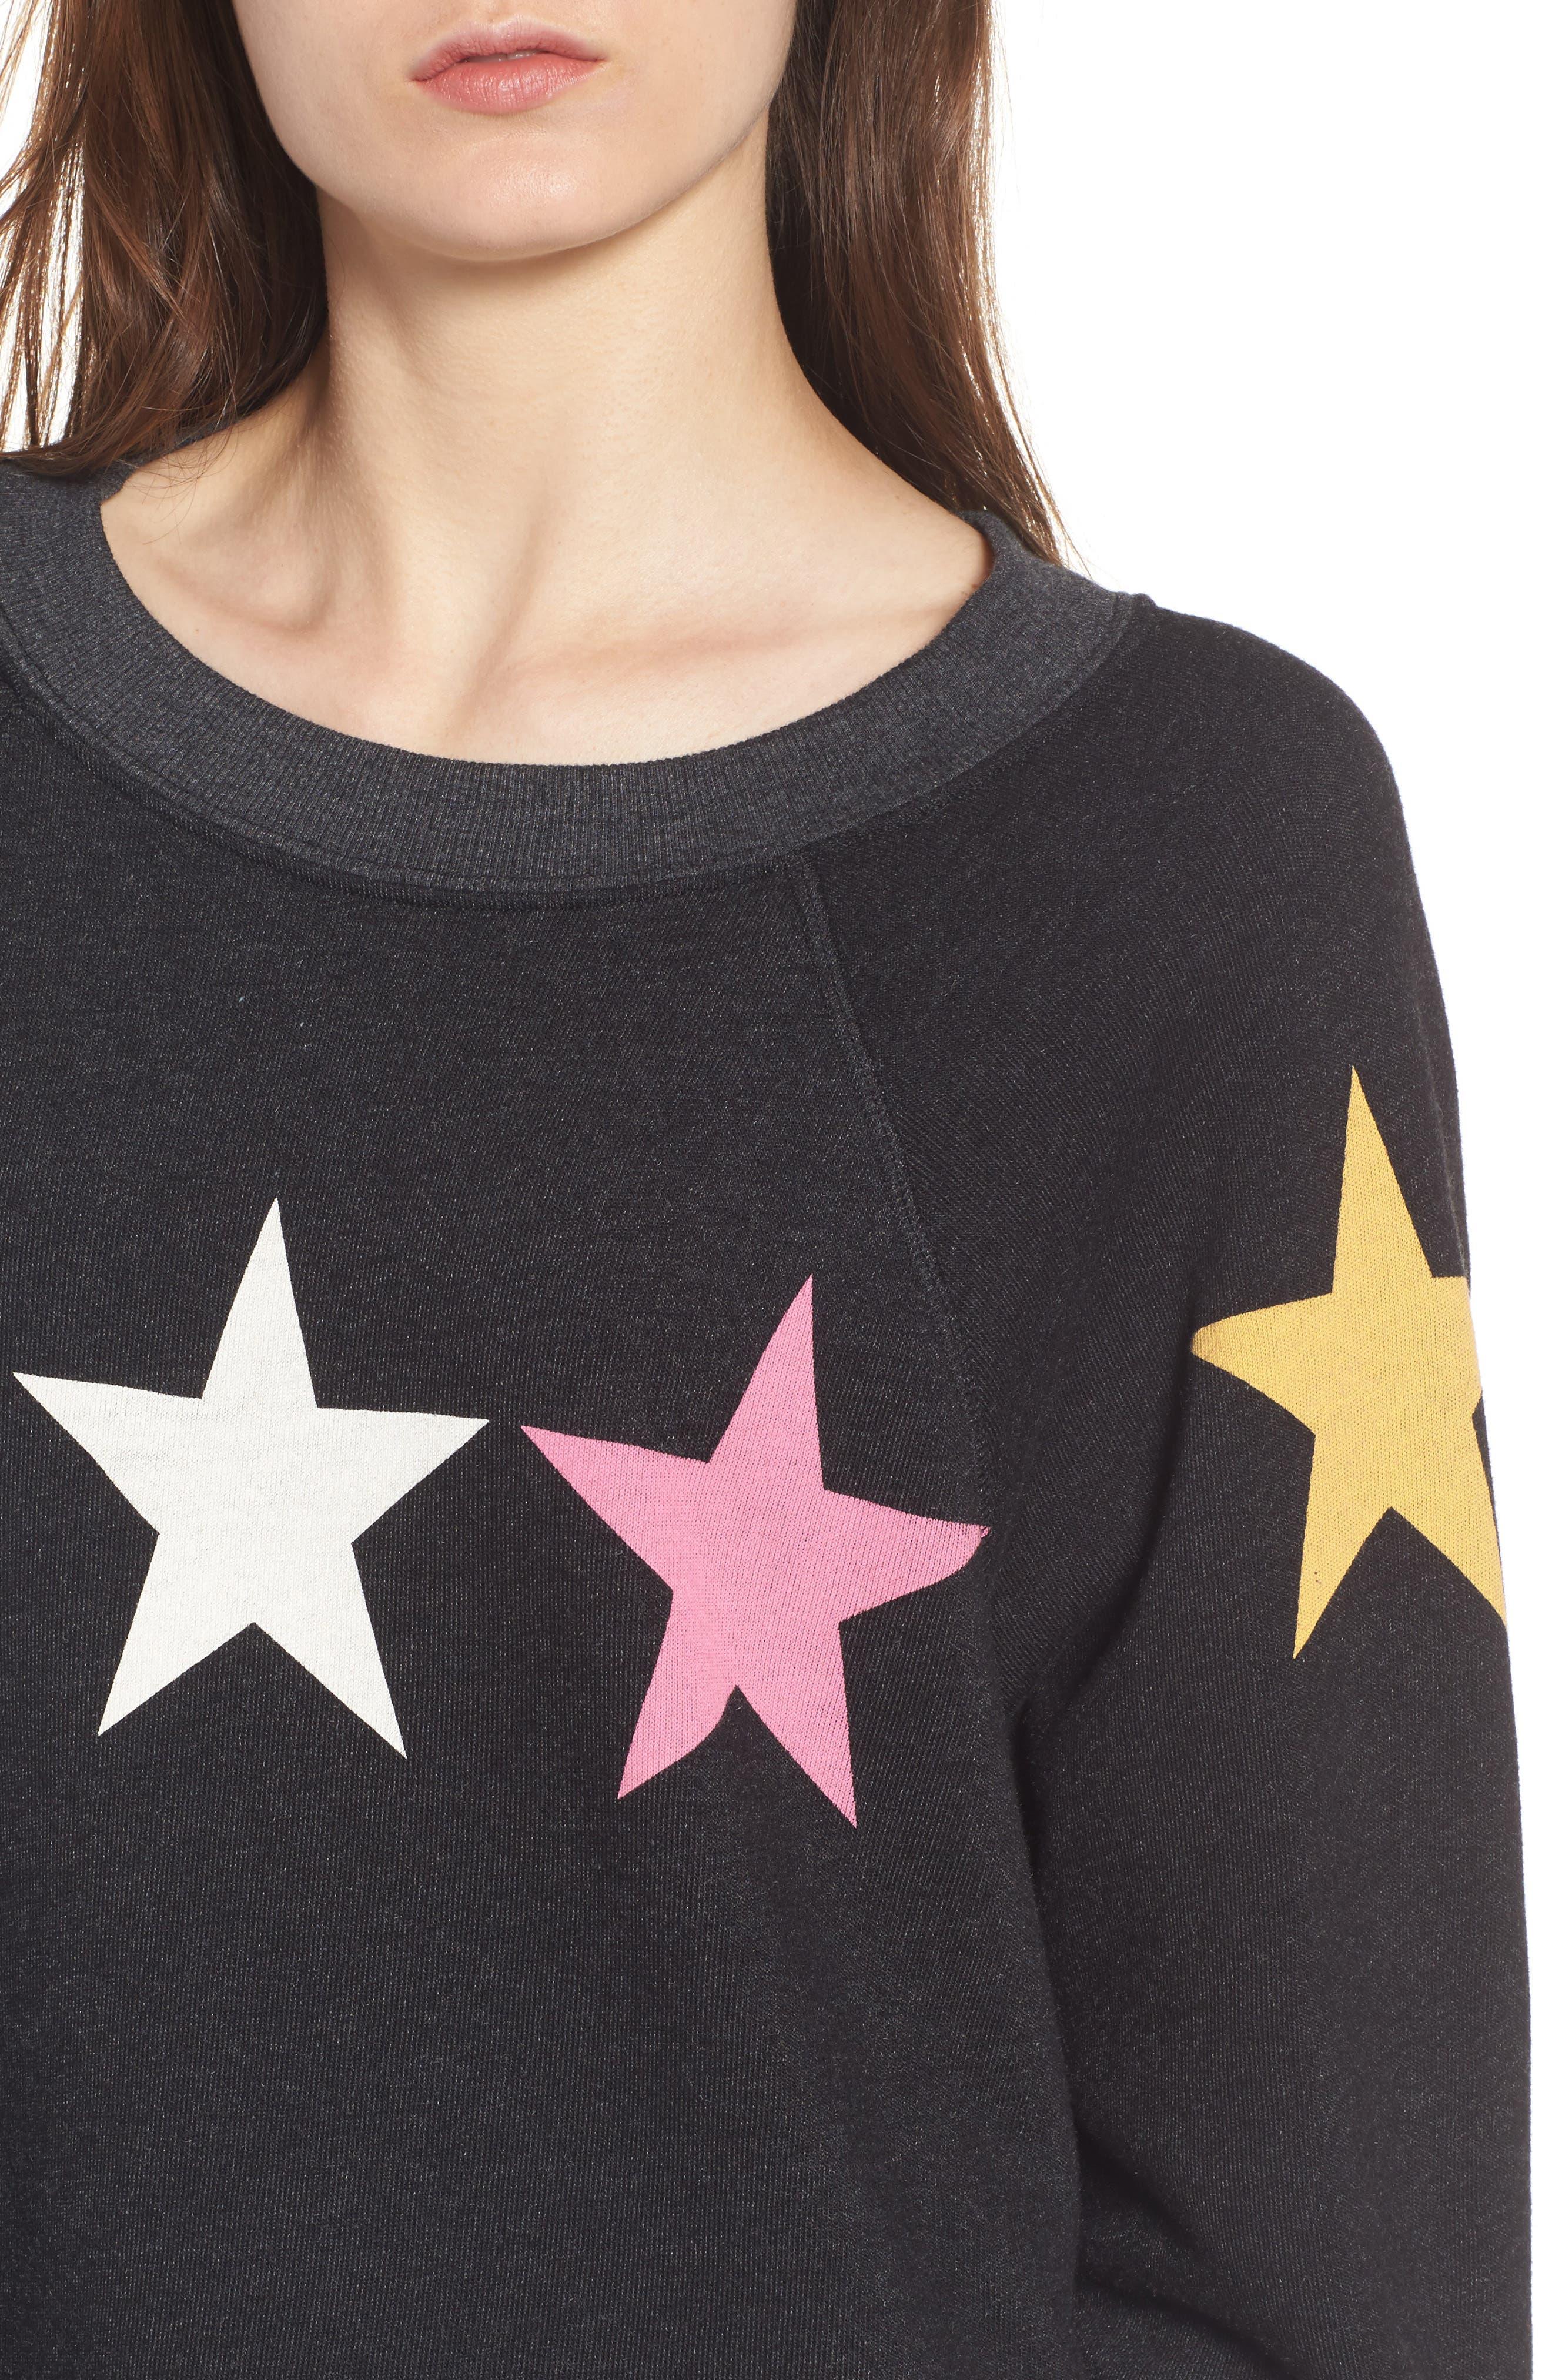 Arcade Stars Sommers Sweatshirt,                             Alternate thumbnail 4, color,                             001